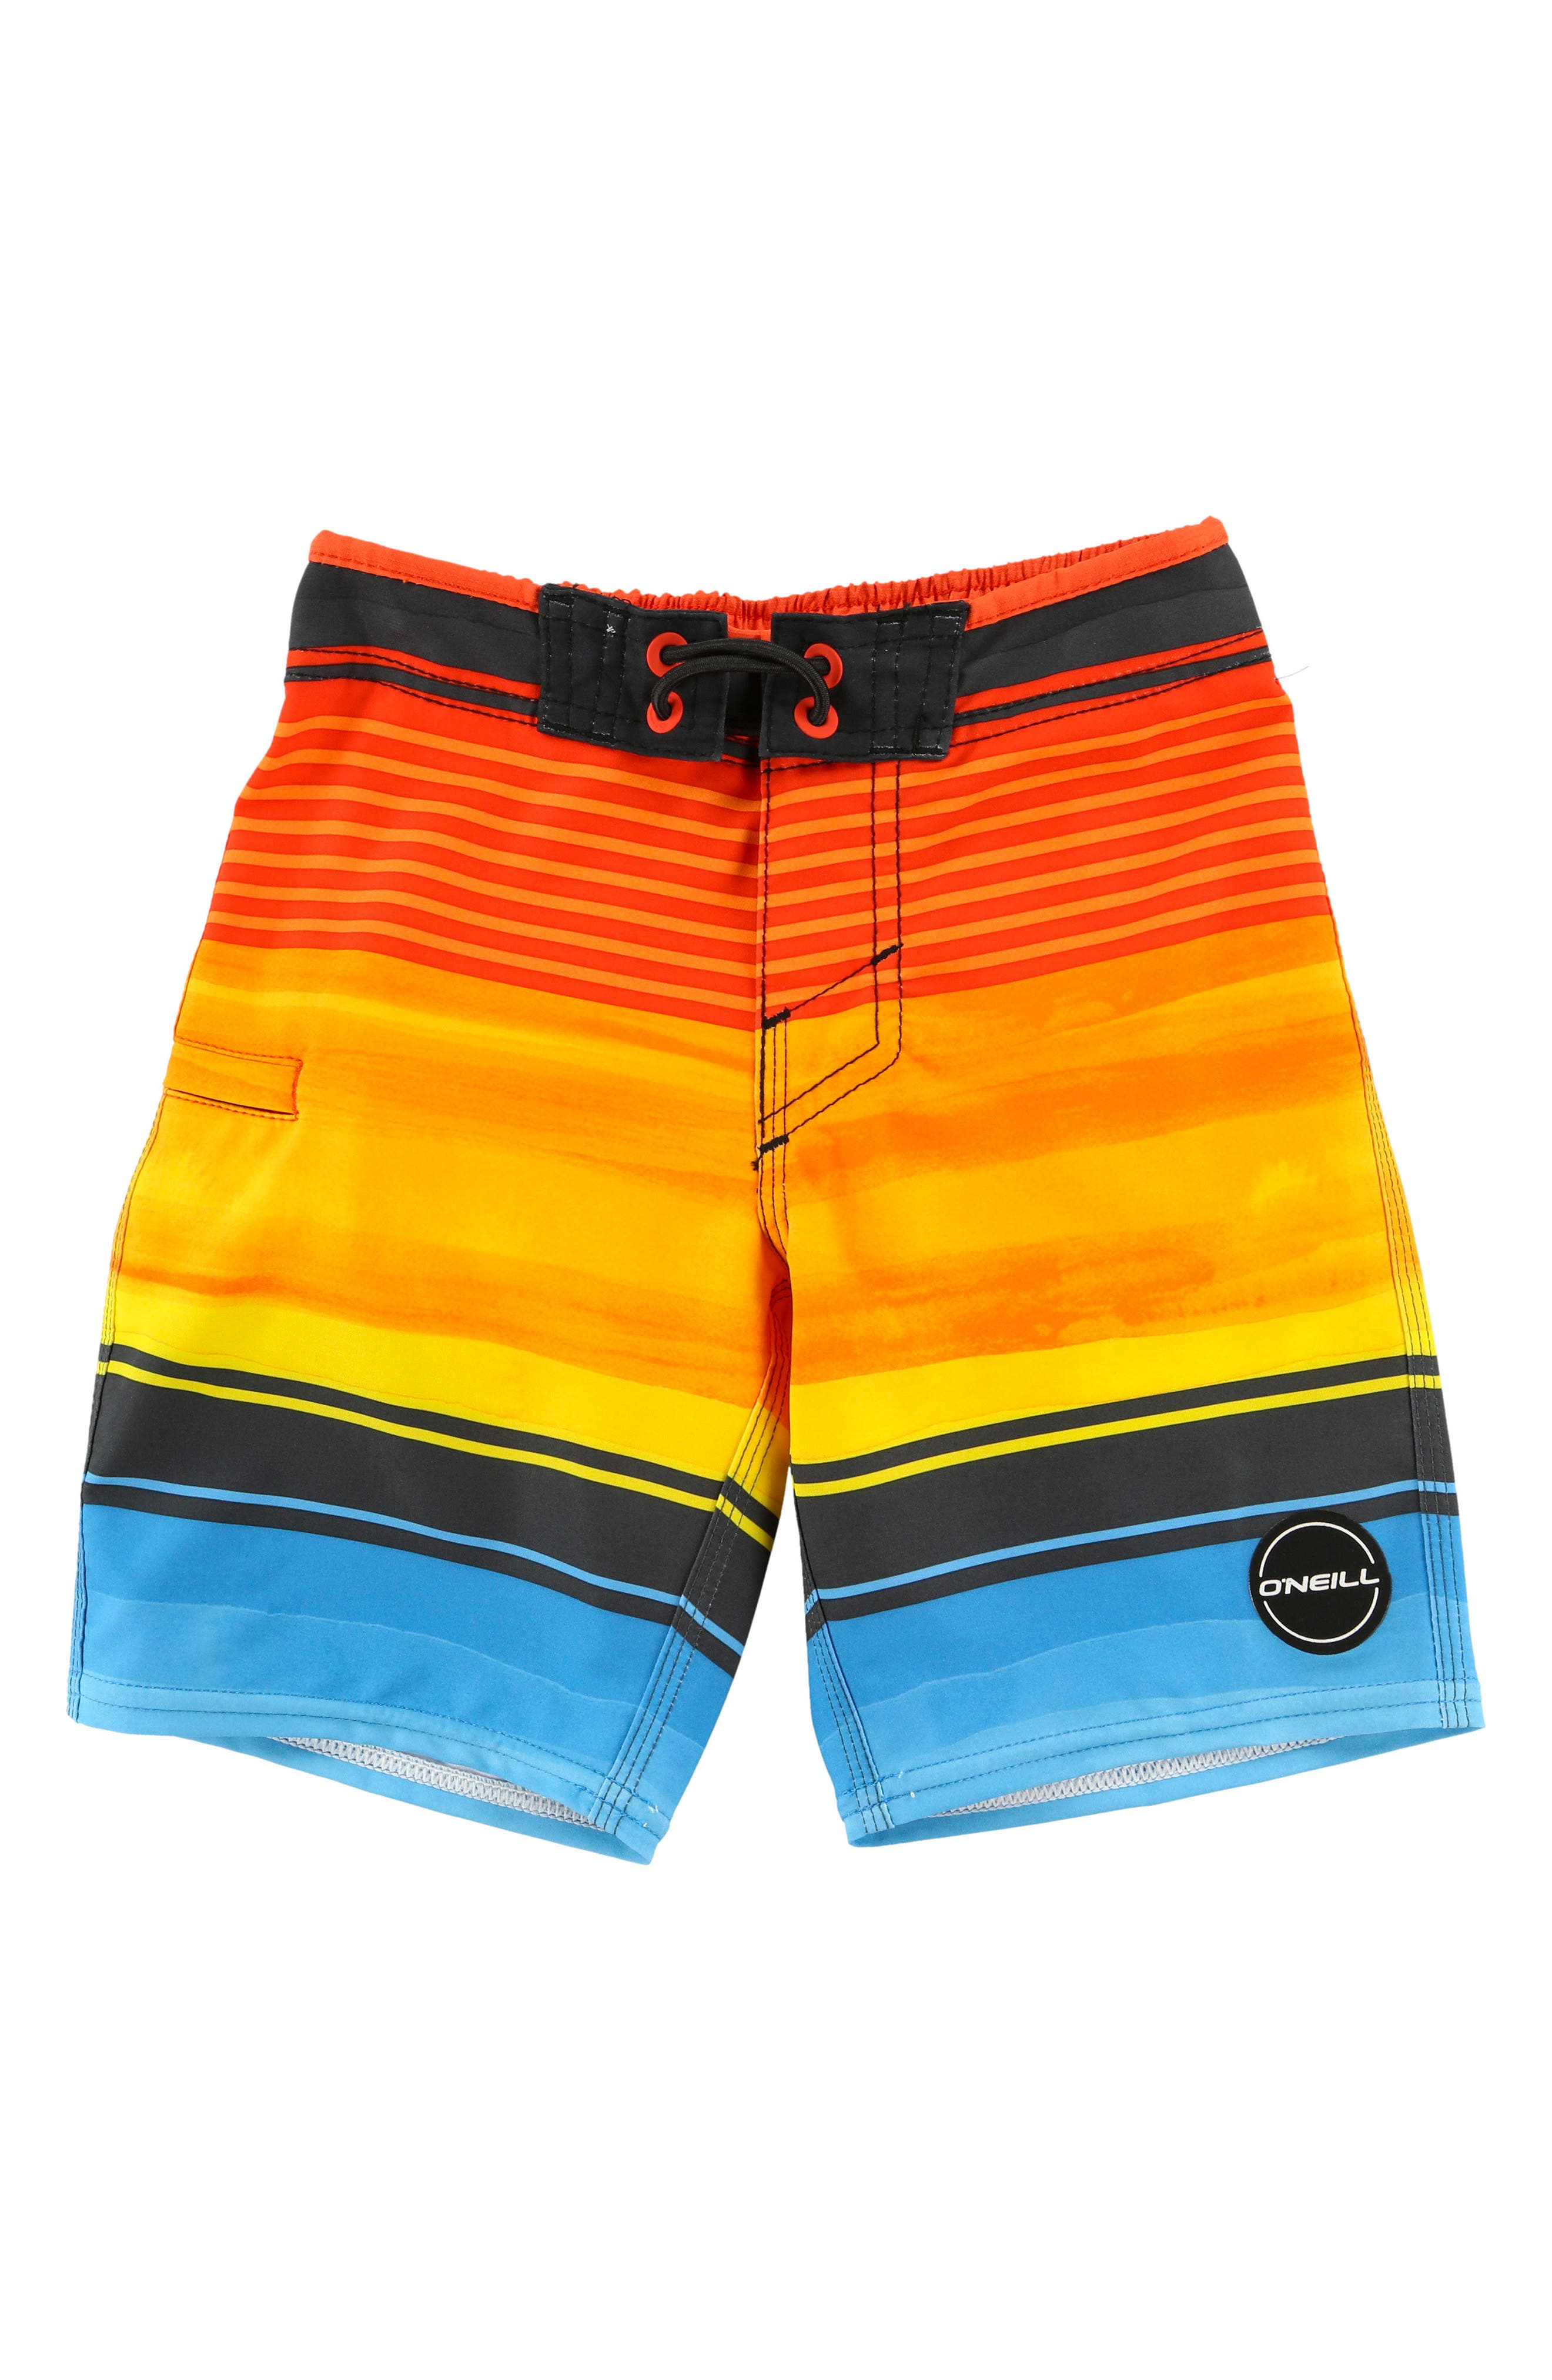 Hyperfreak Heist Board Shorts,                             Main thumbnail 1, color,                             Orange